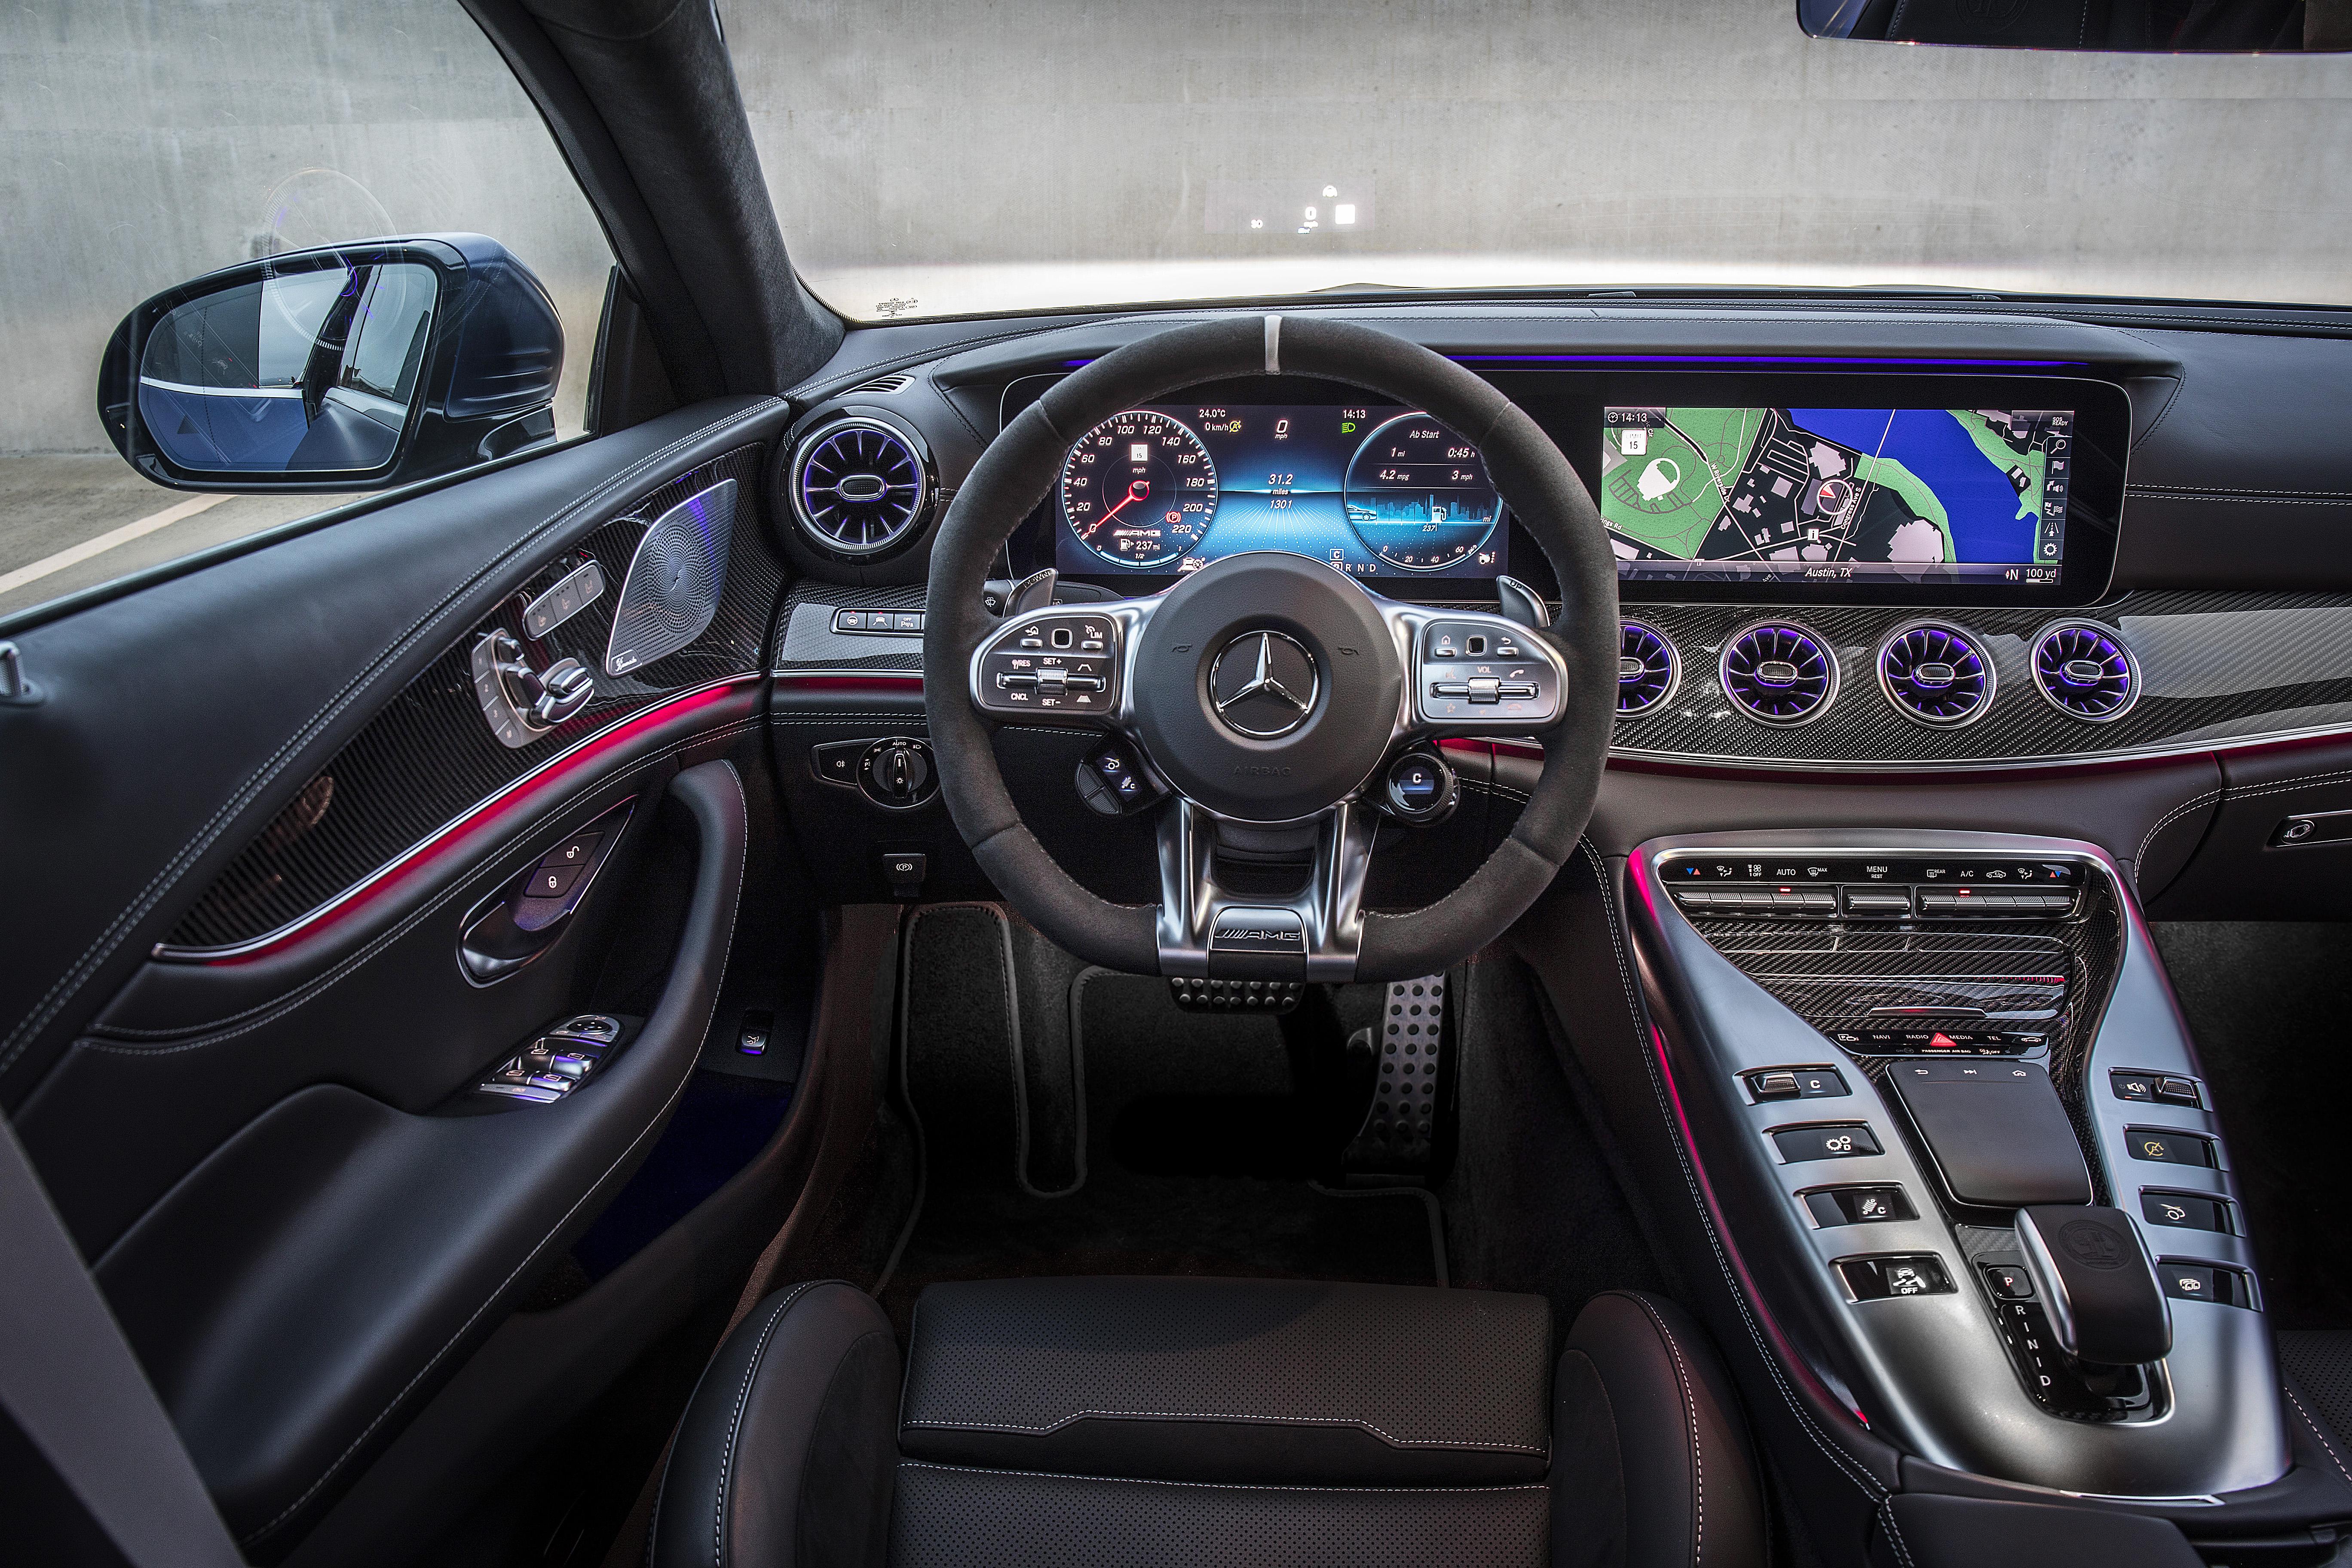 Mercedes gt63s